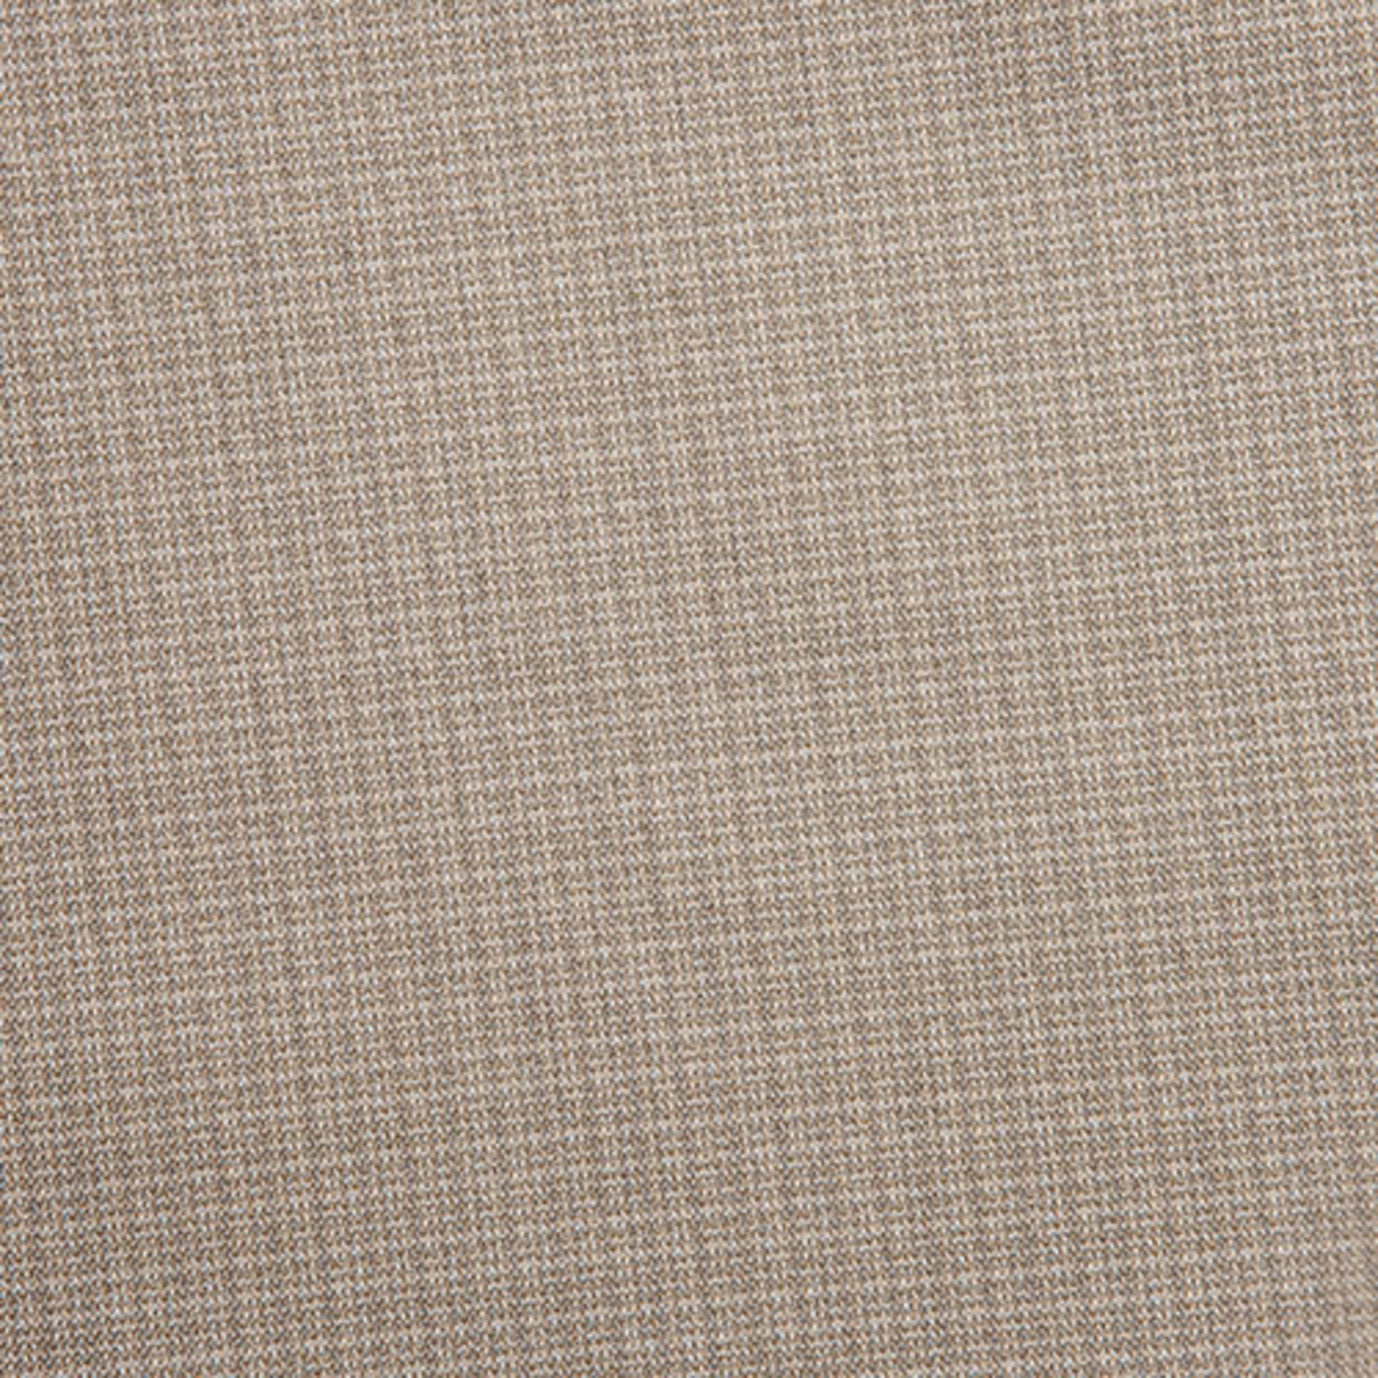 Deco™ Club Ottomans - Slate Gray